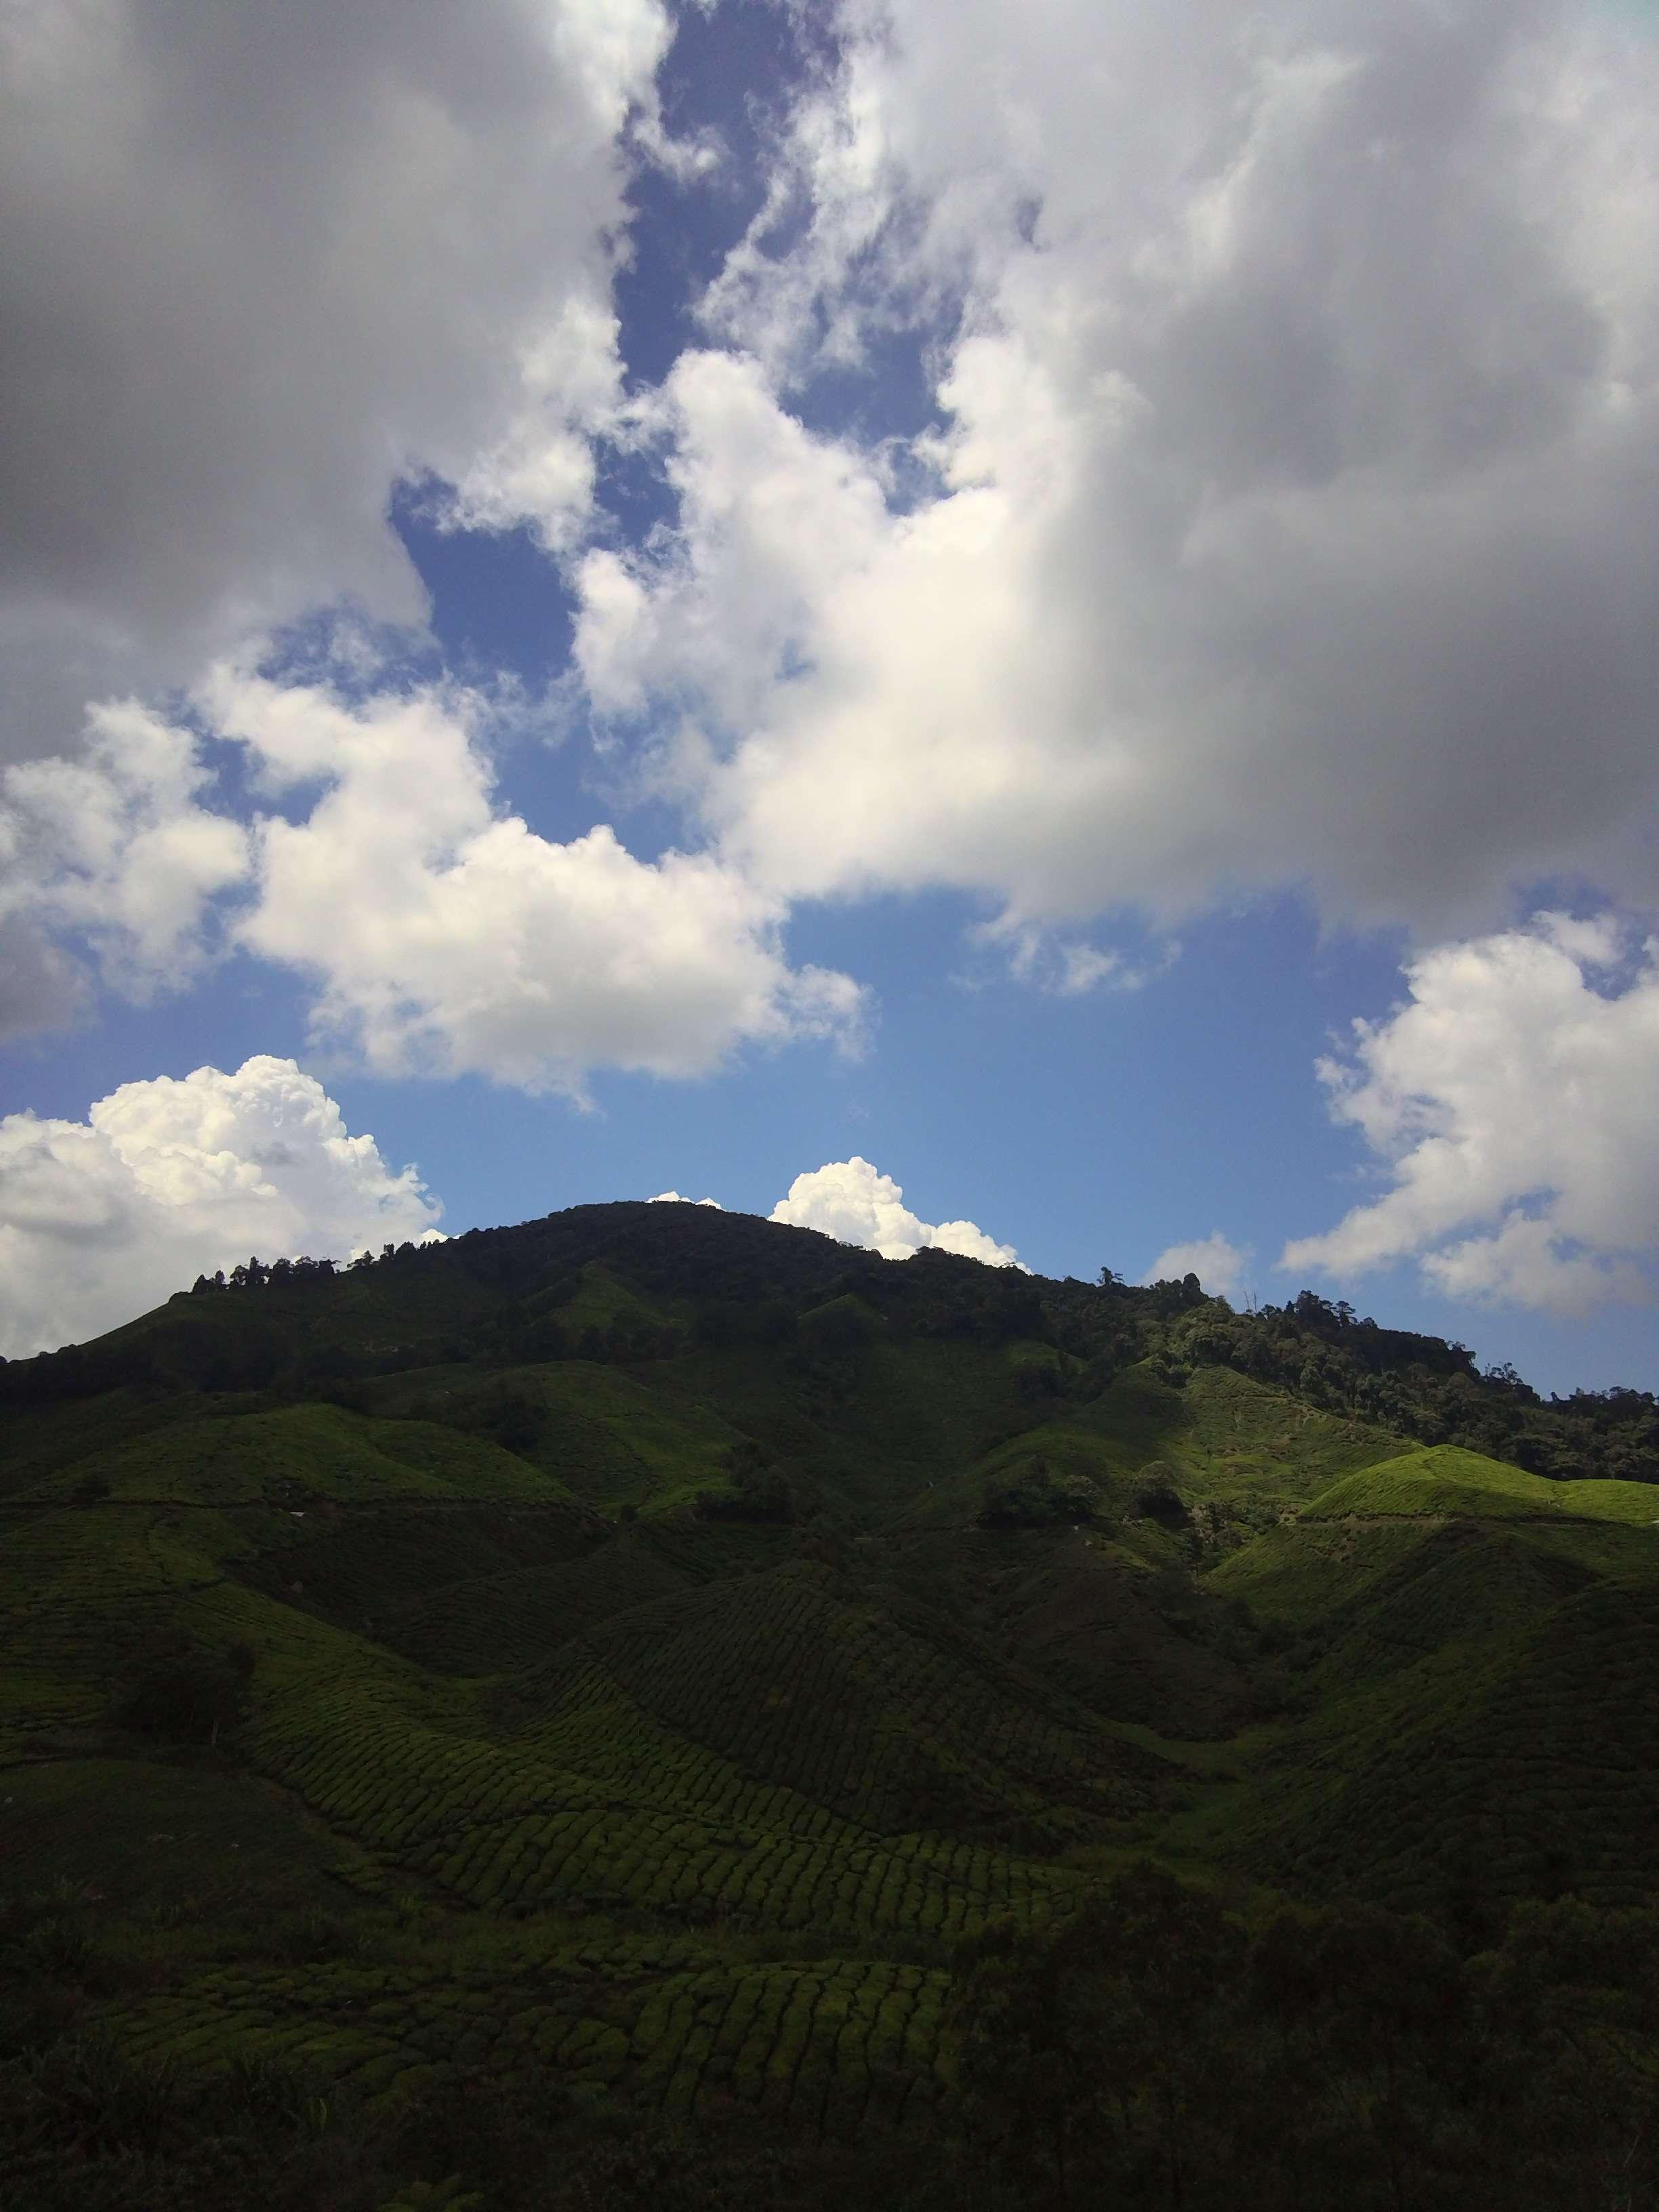 Walking to the Boh Tea Plantation